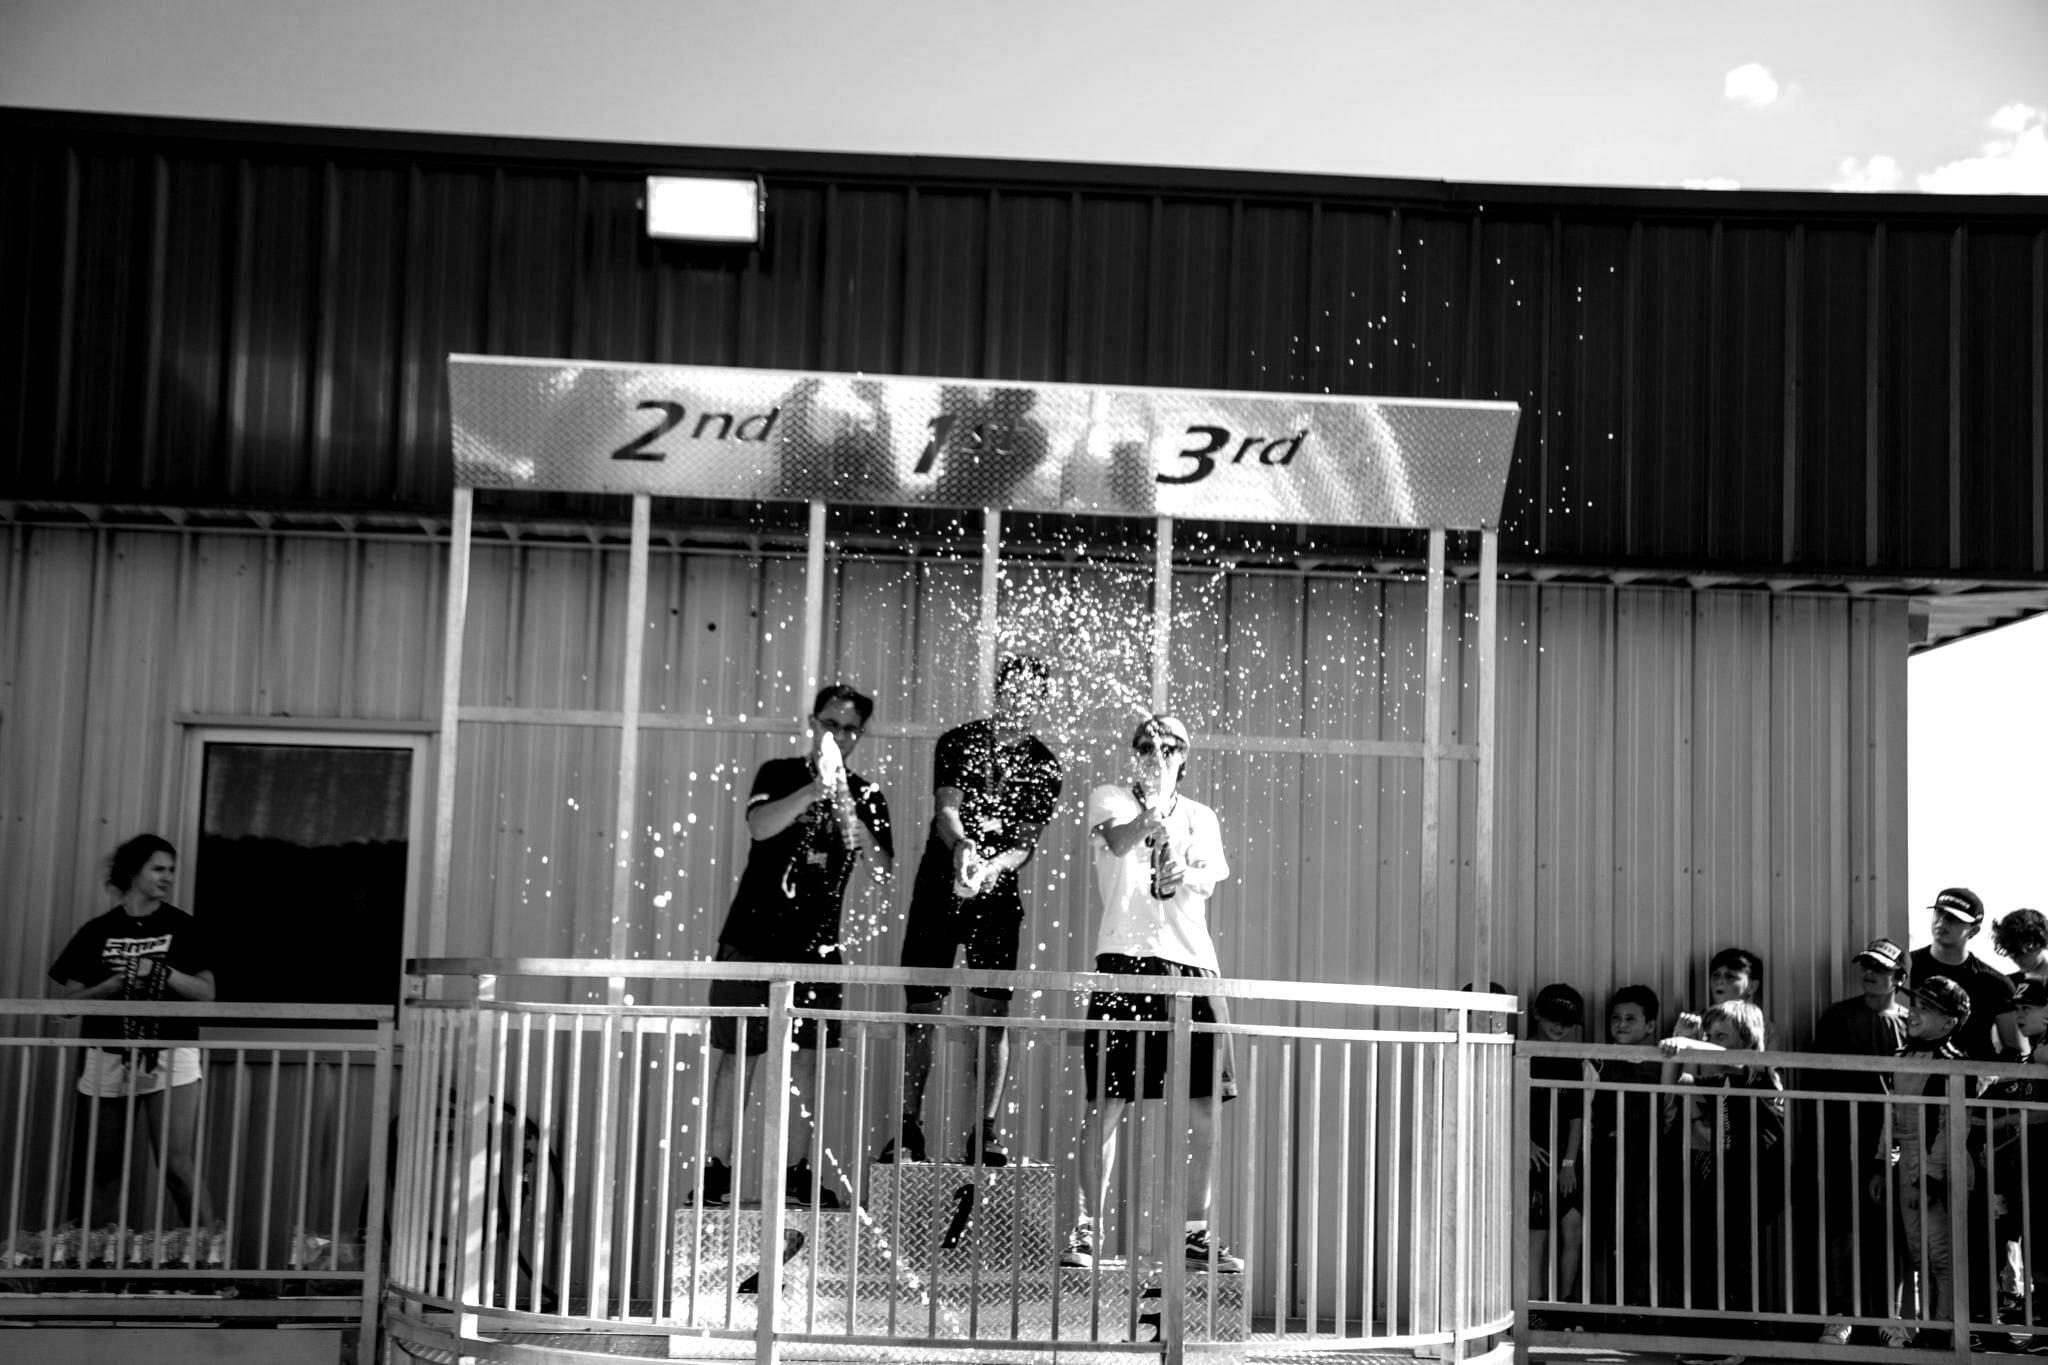 Photo Jun 12 6 03 31 PM scaled blackwhite - Race Series